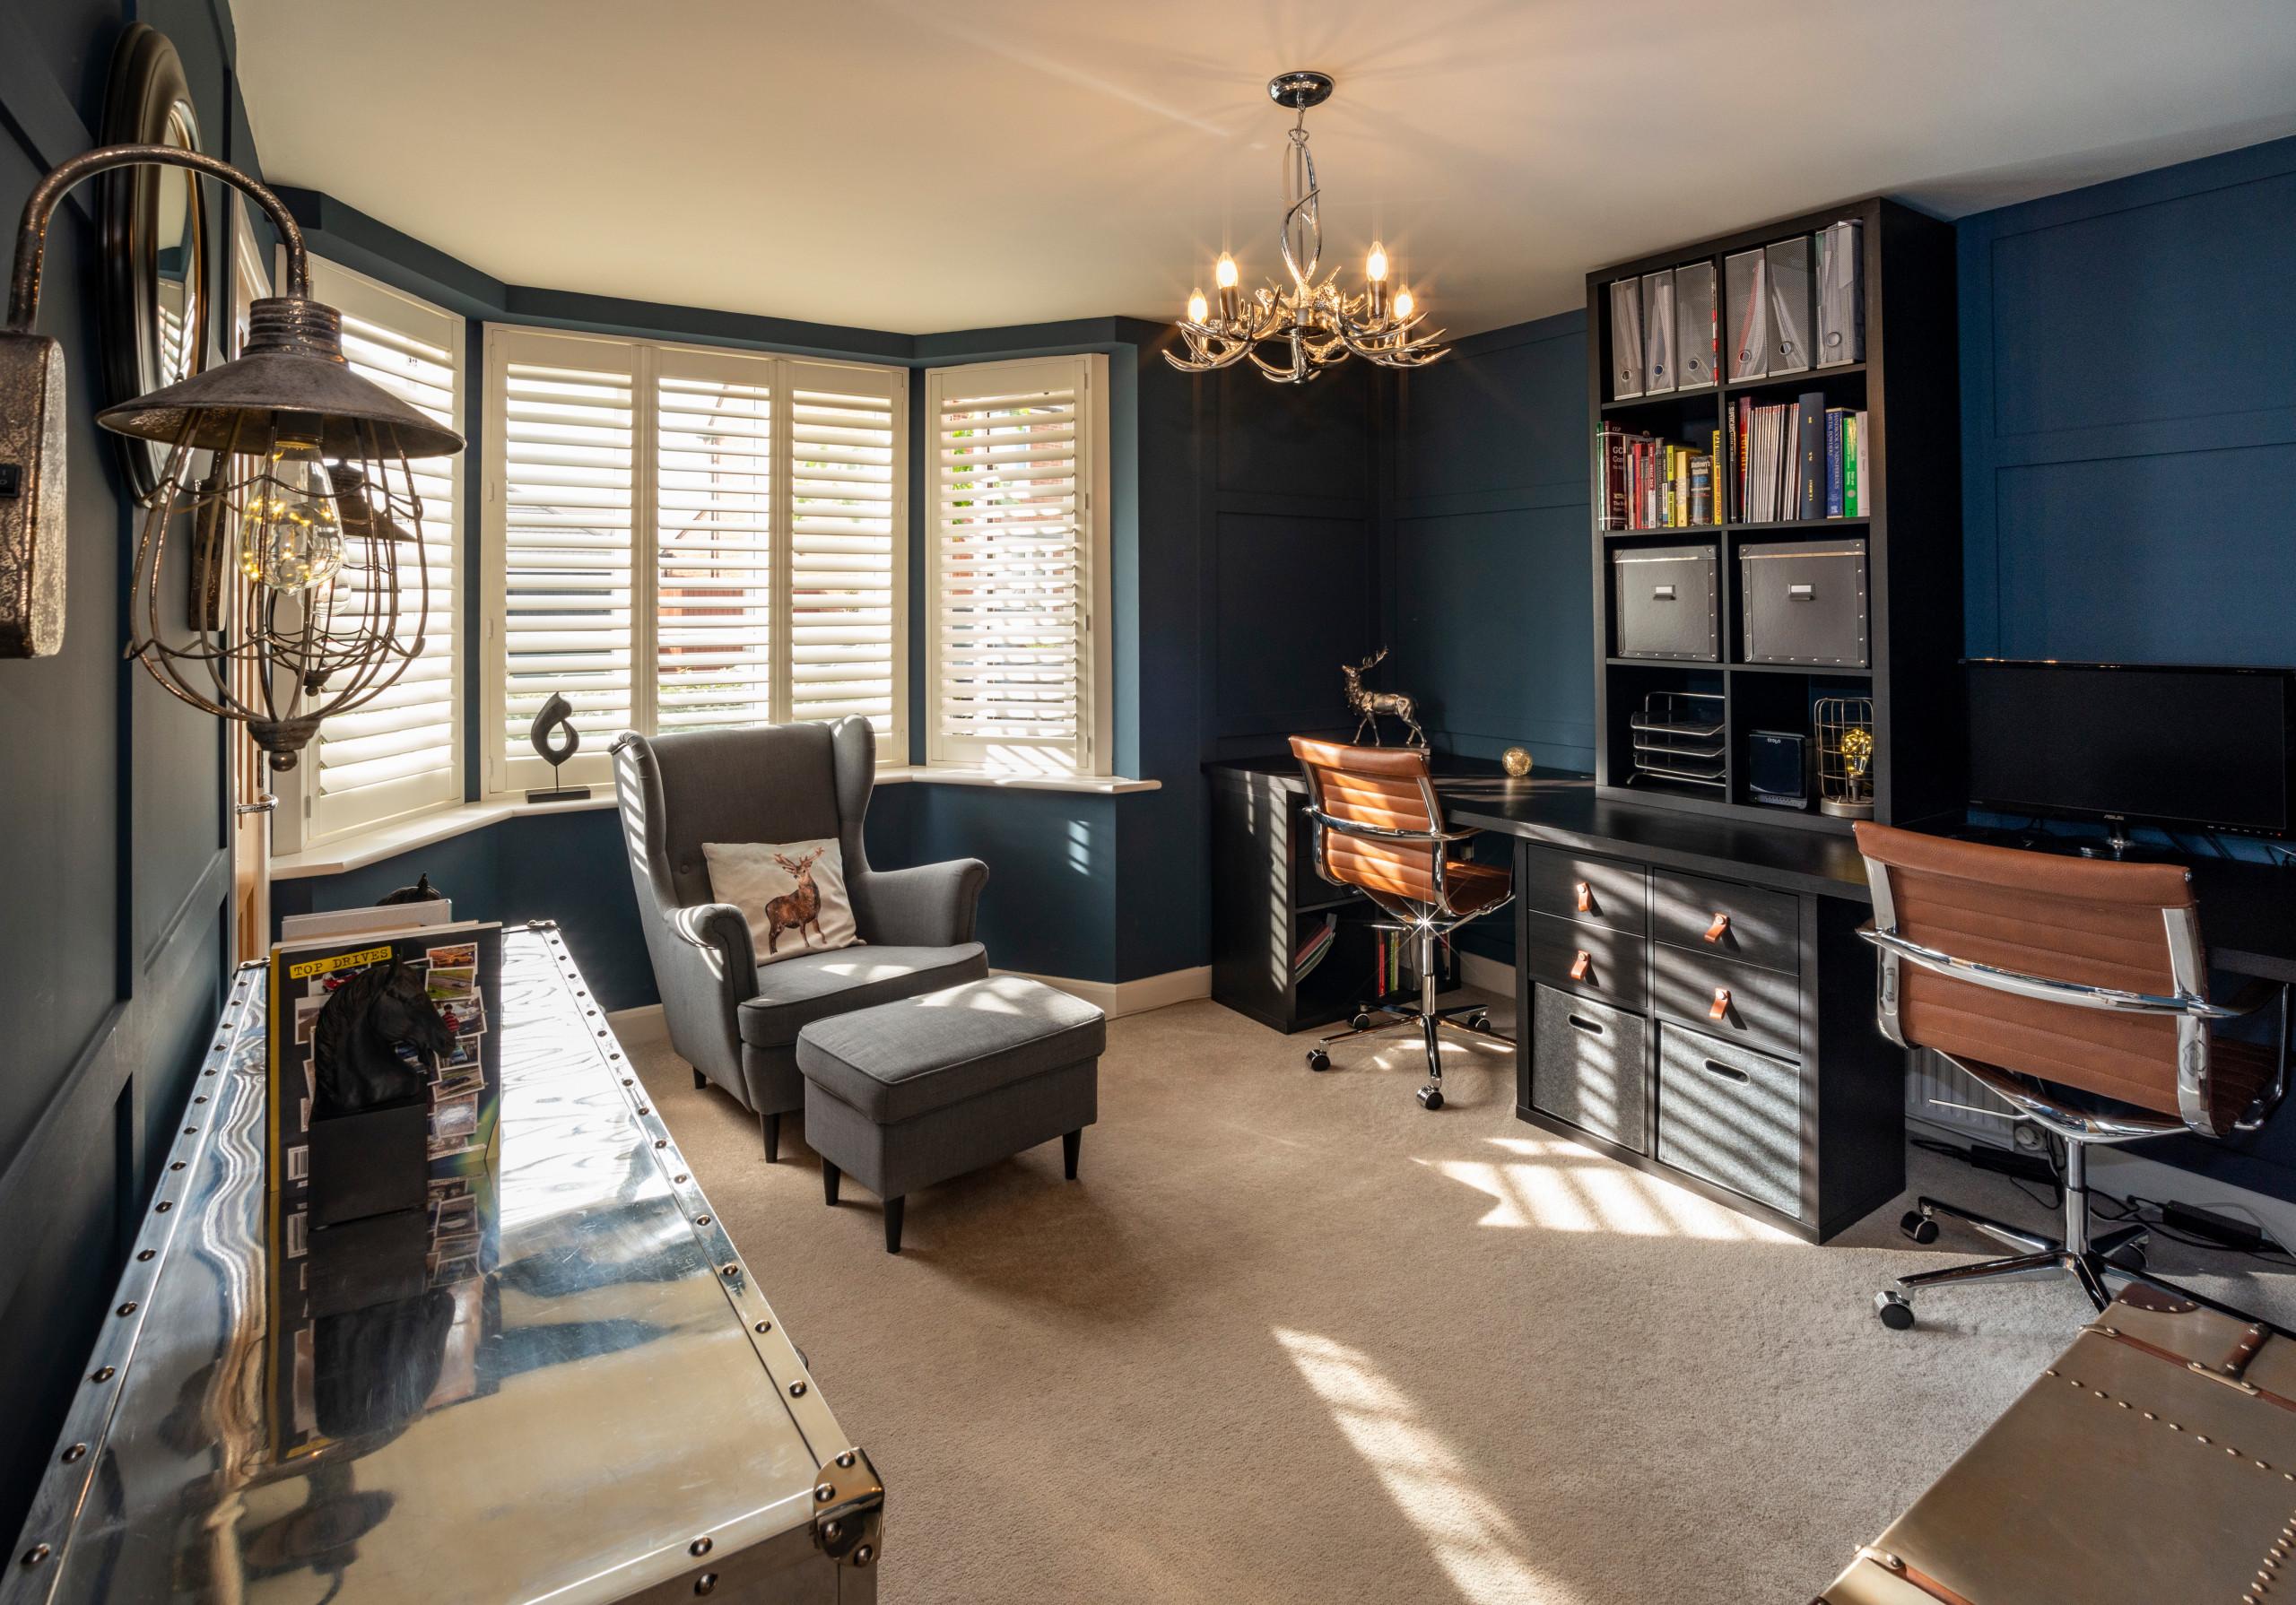 Barleston, Staffordshire residence